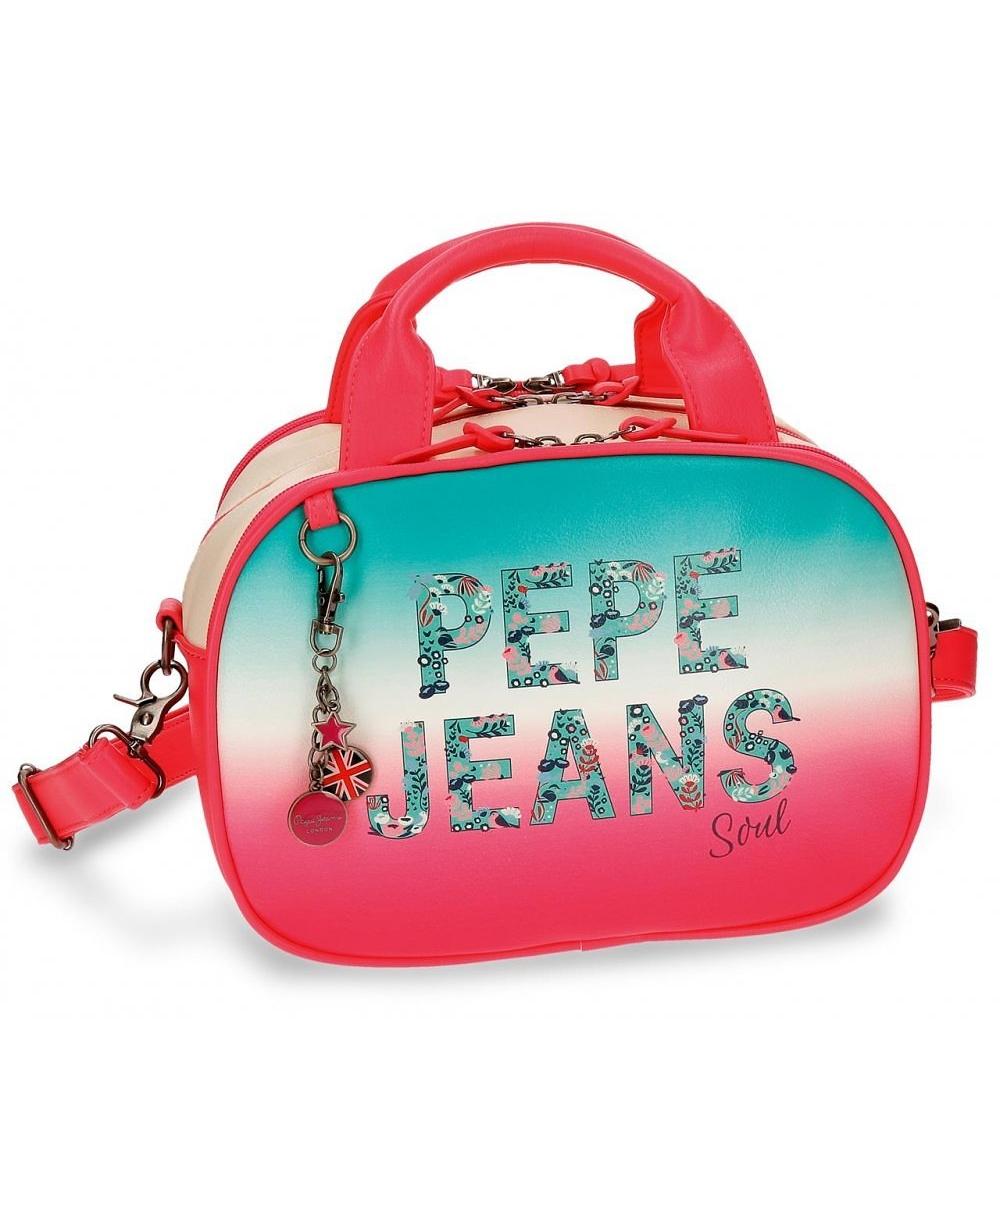 Pepe Jeans Nicole Neceser Rosa (Foto )